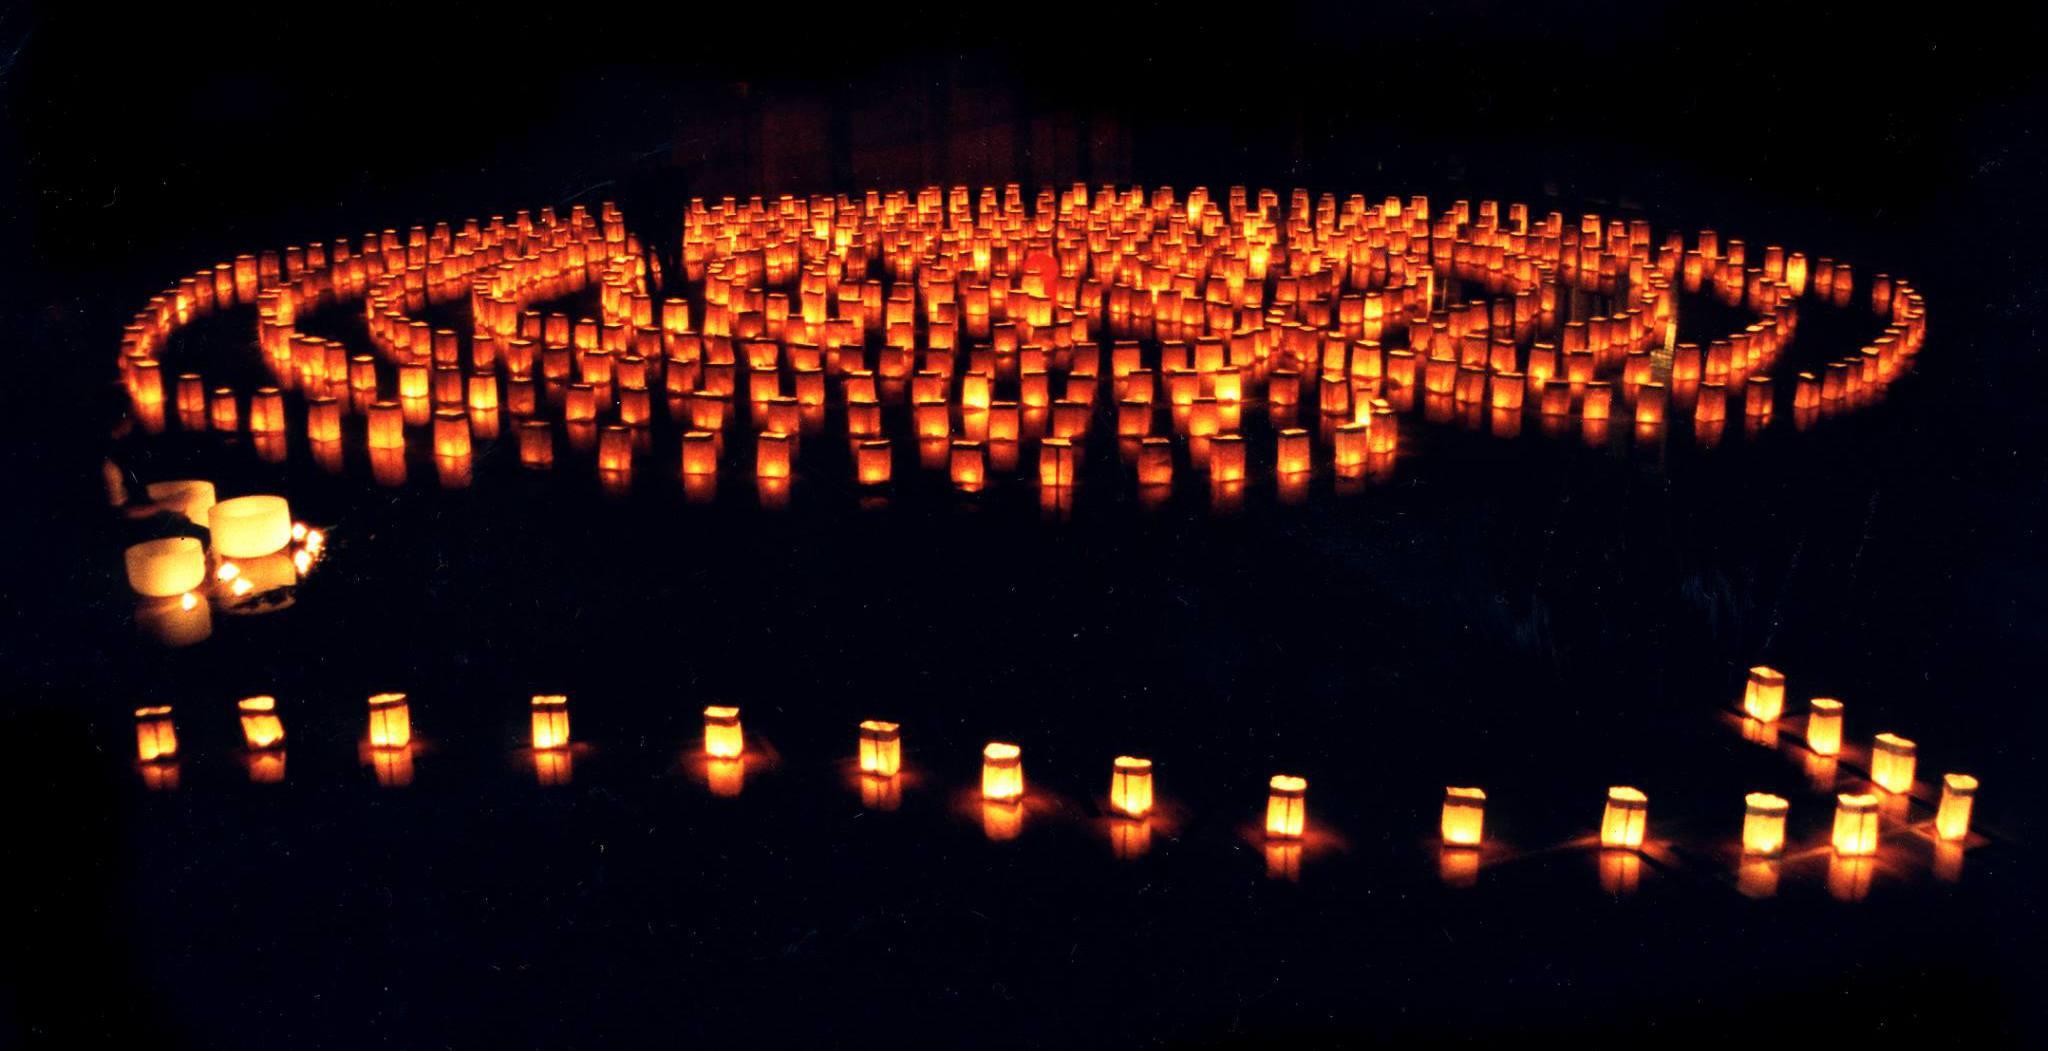 Winter Solstice Lantern Festival 2017 brings huge Labyrinths of Light to Vancouver